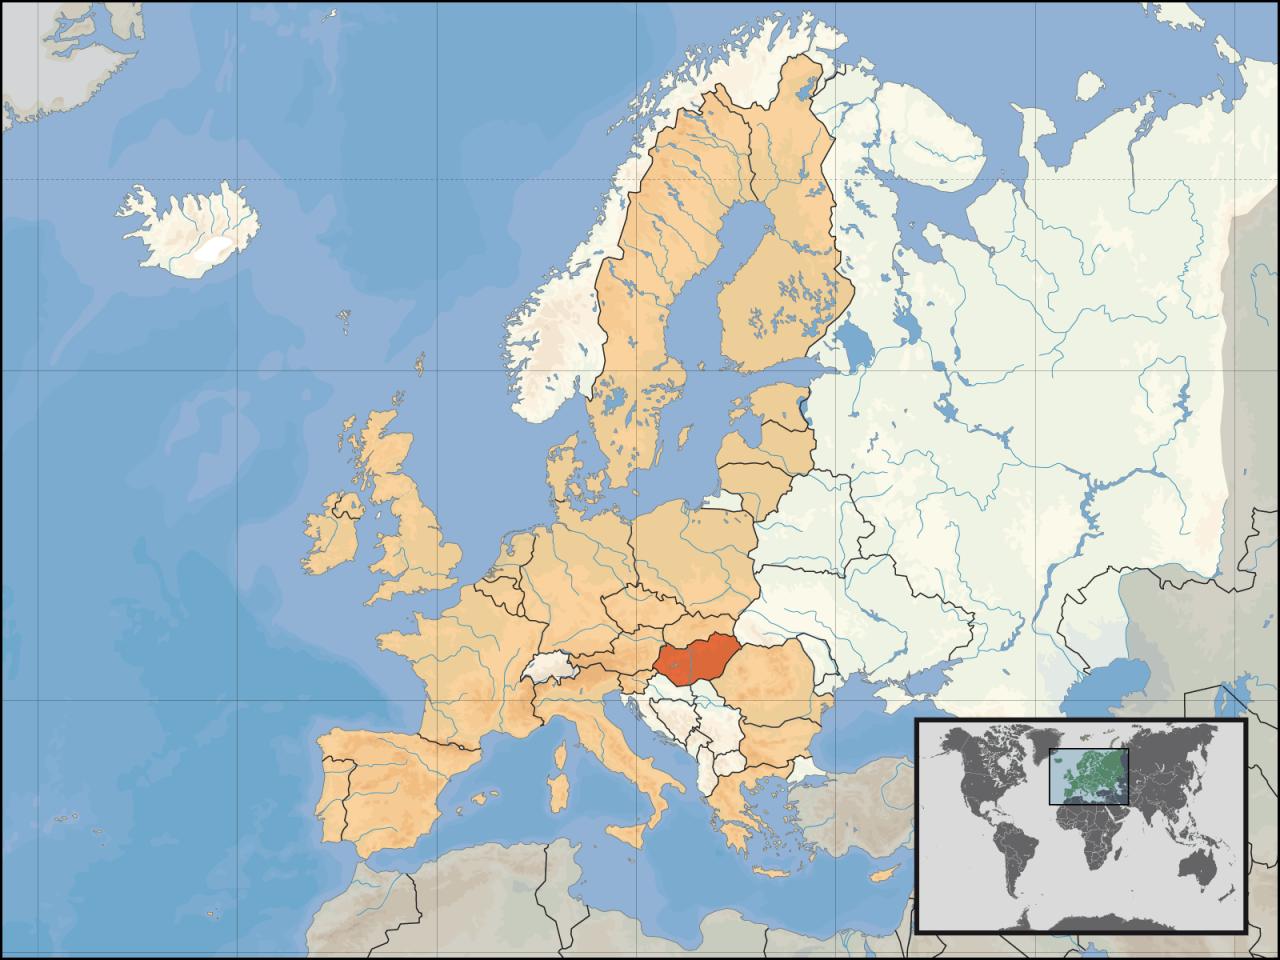 Lokalizacja Węgier na tle Europy